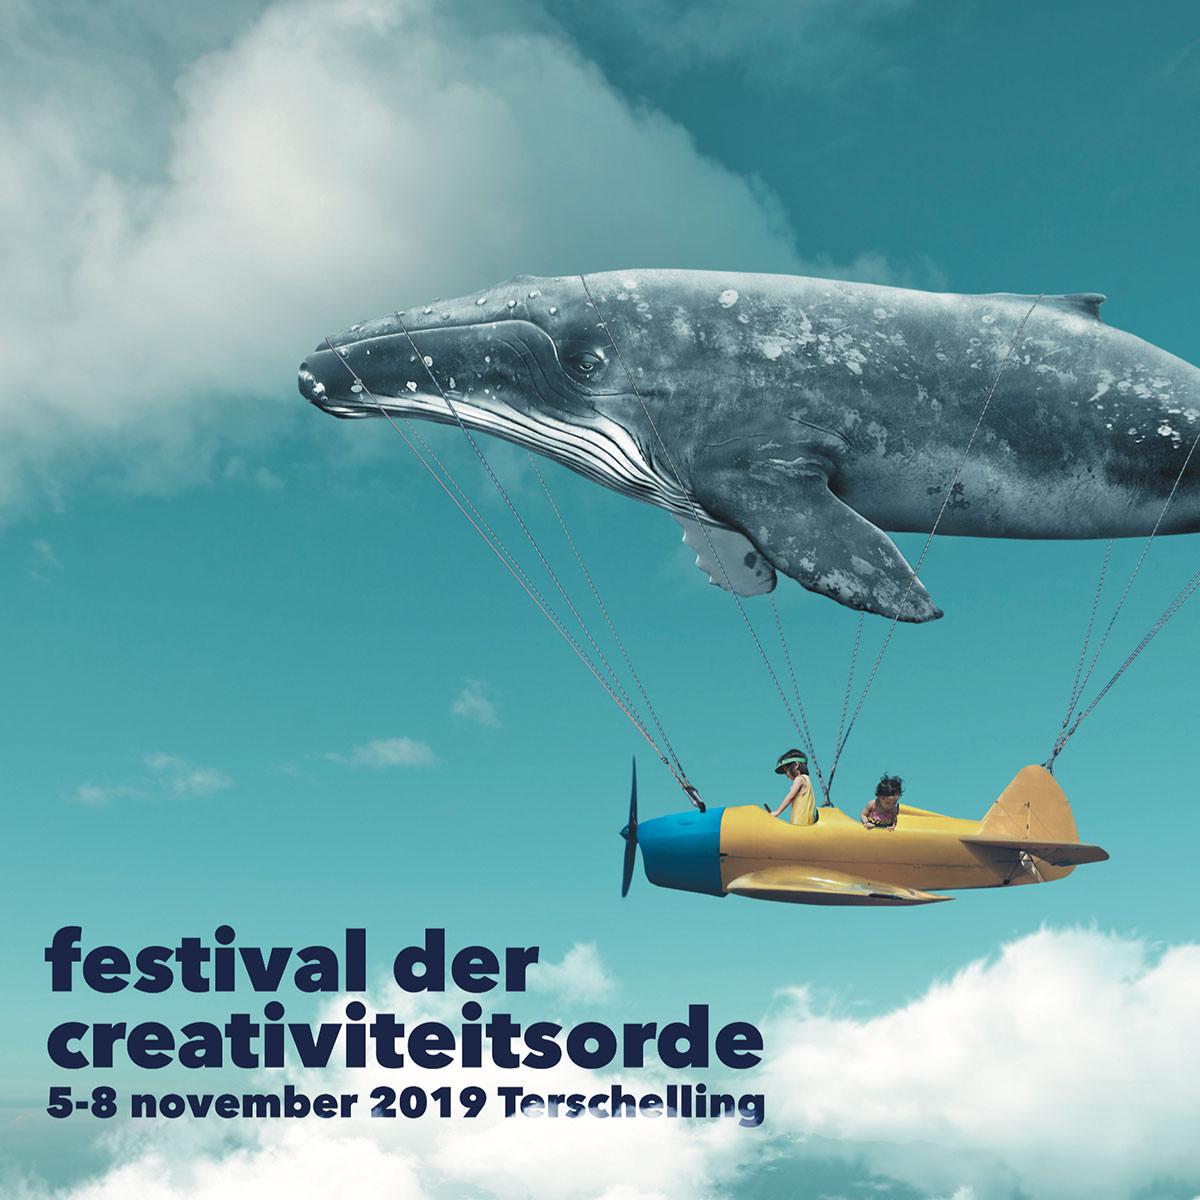 CVI-festival-der-creativiteitsorde